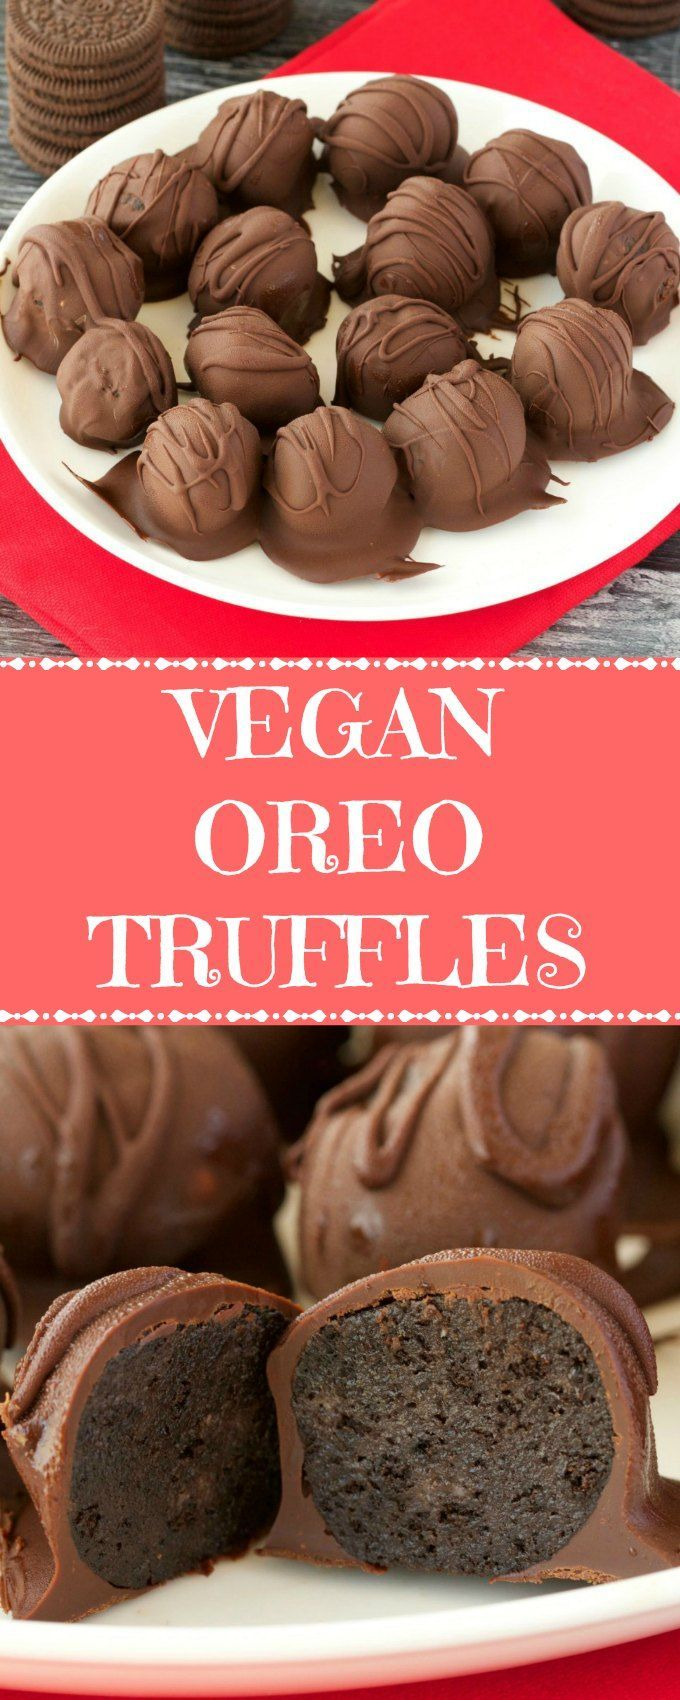 Vegan Oreo Truffles